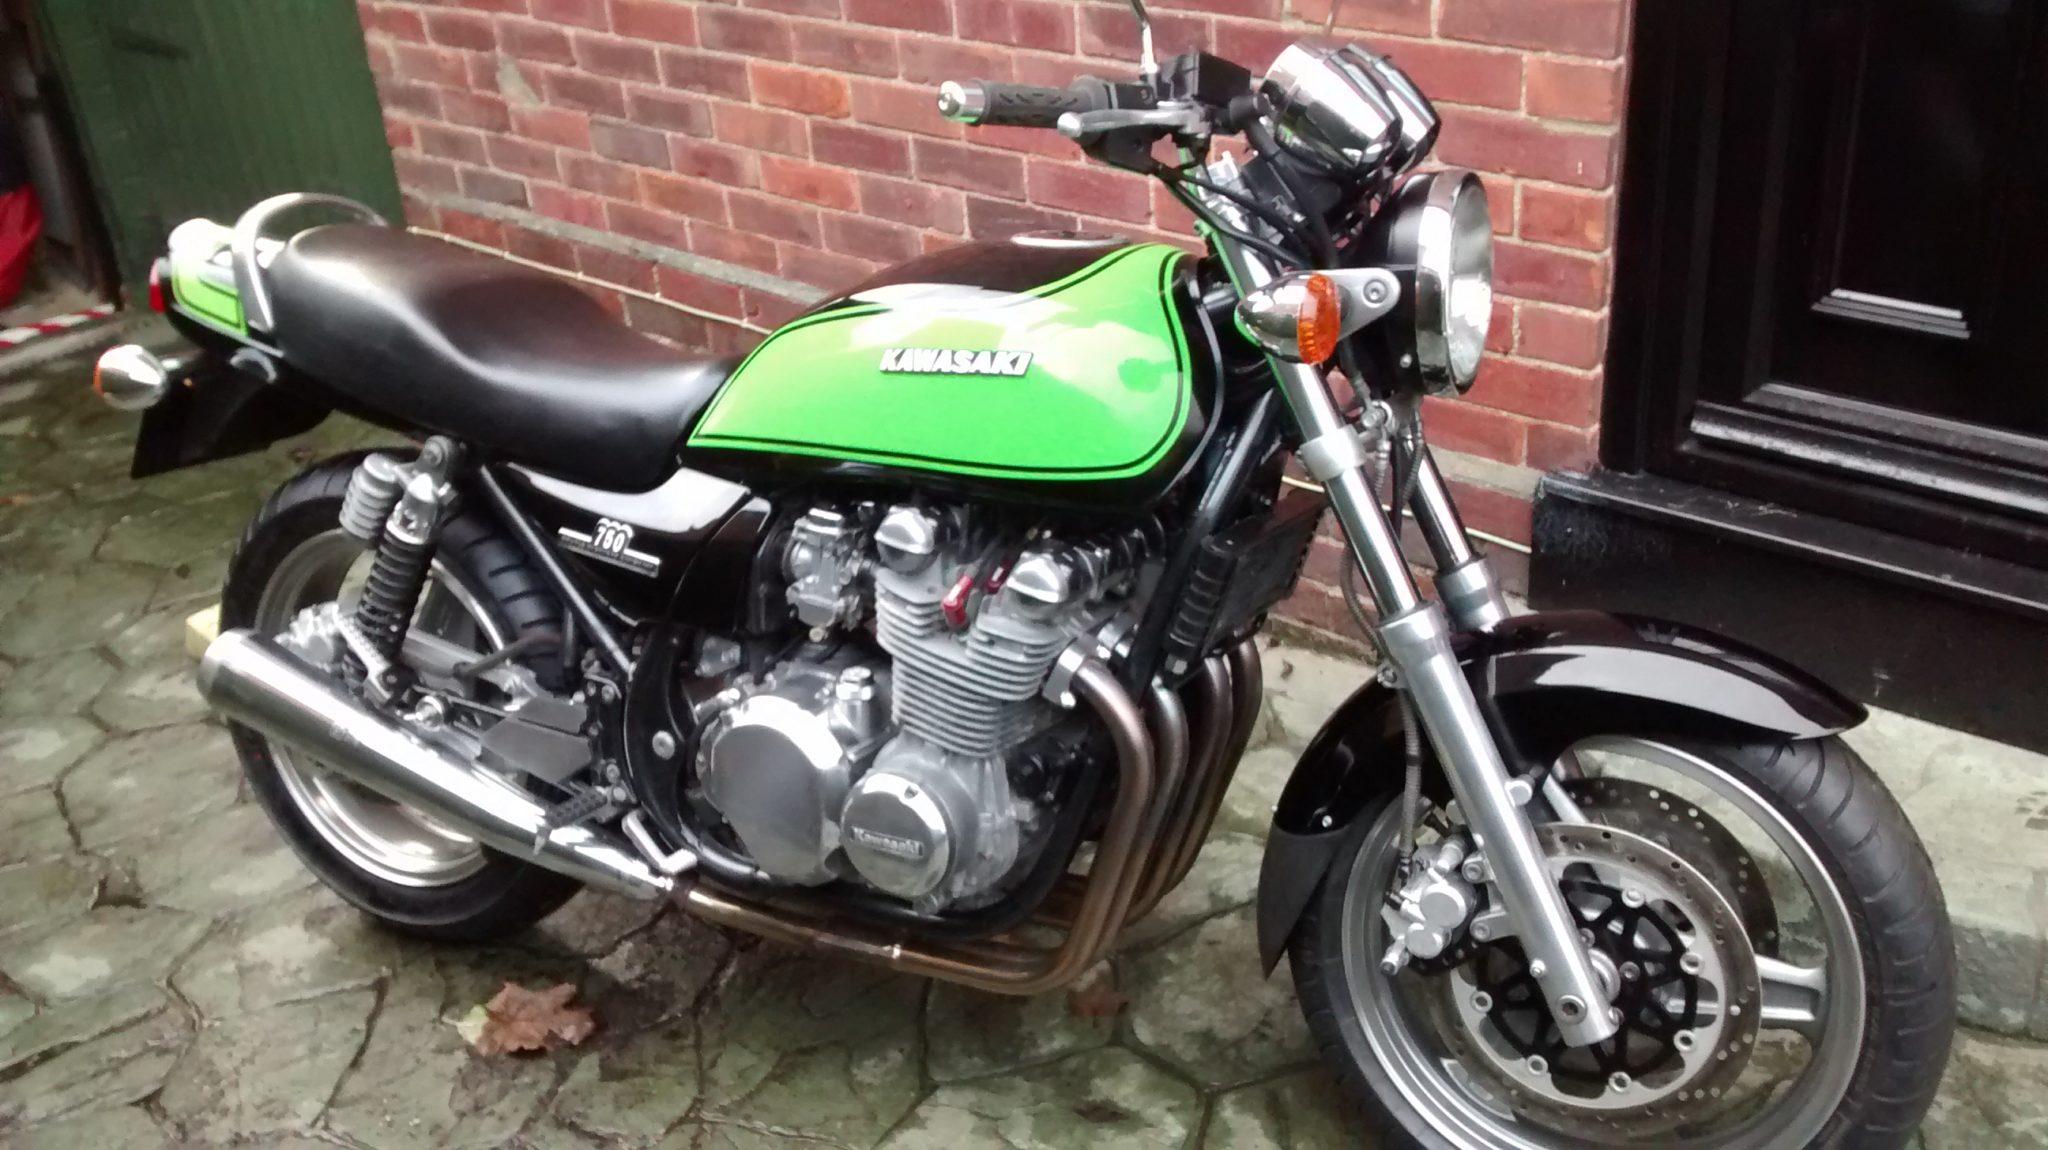 Stuart Knight – Kawasaki ZEPHYR 750